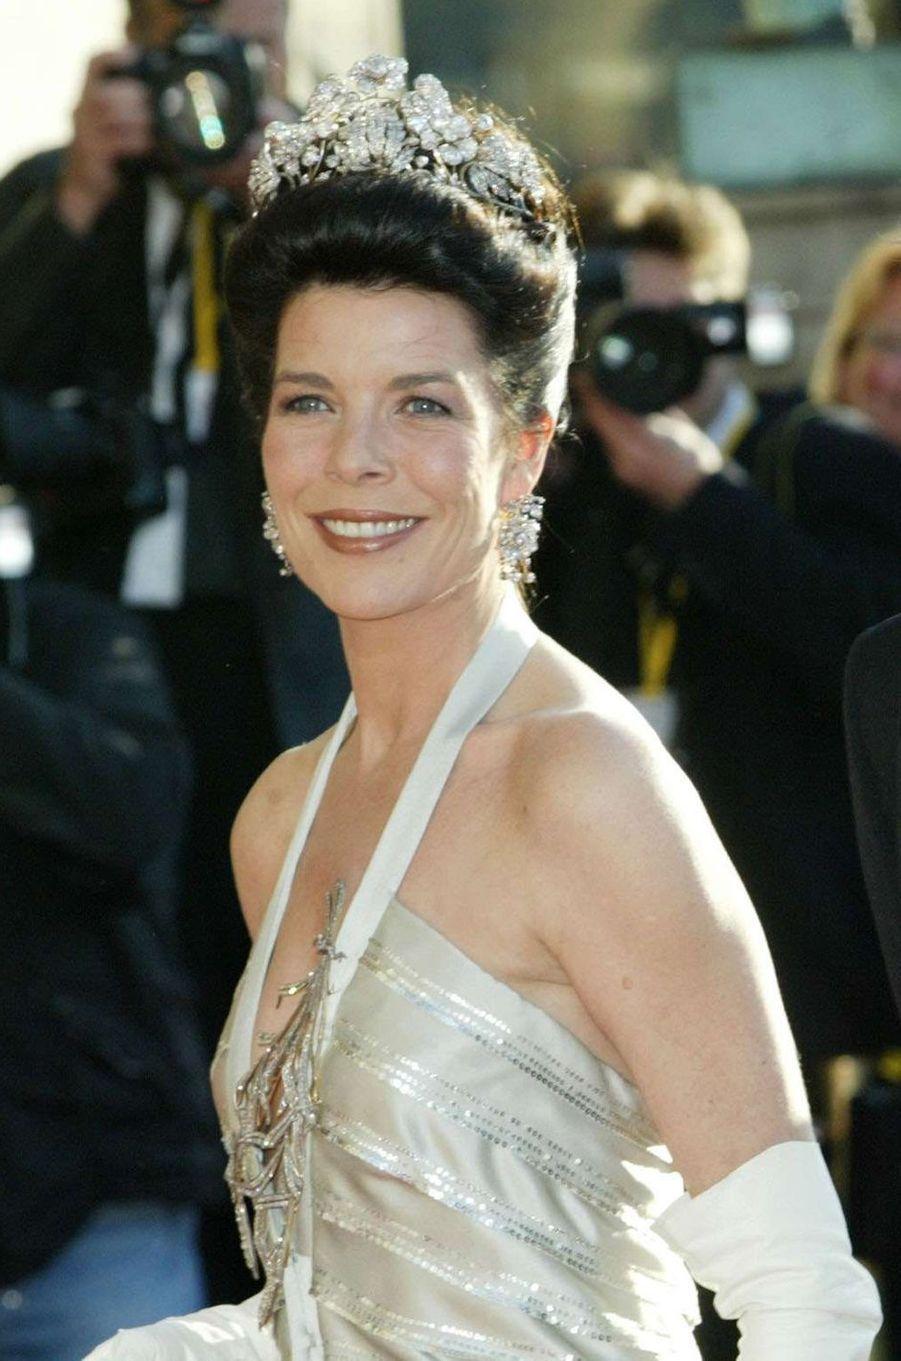 Caroline de Monaco, princesse de Hanovre, le 13 mai 2004